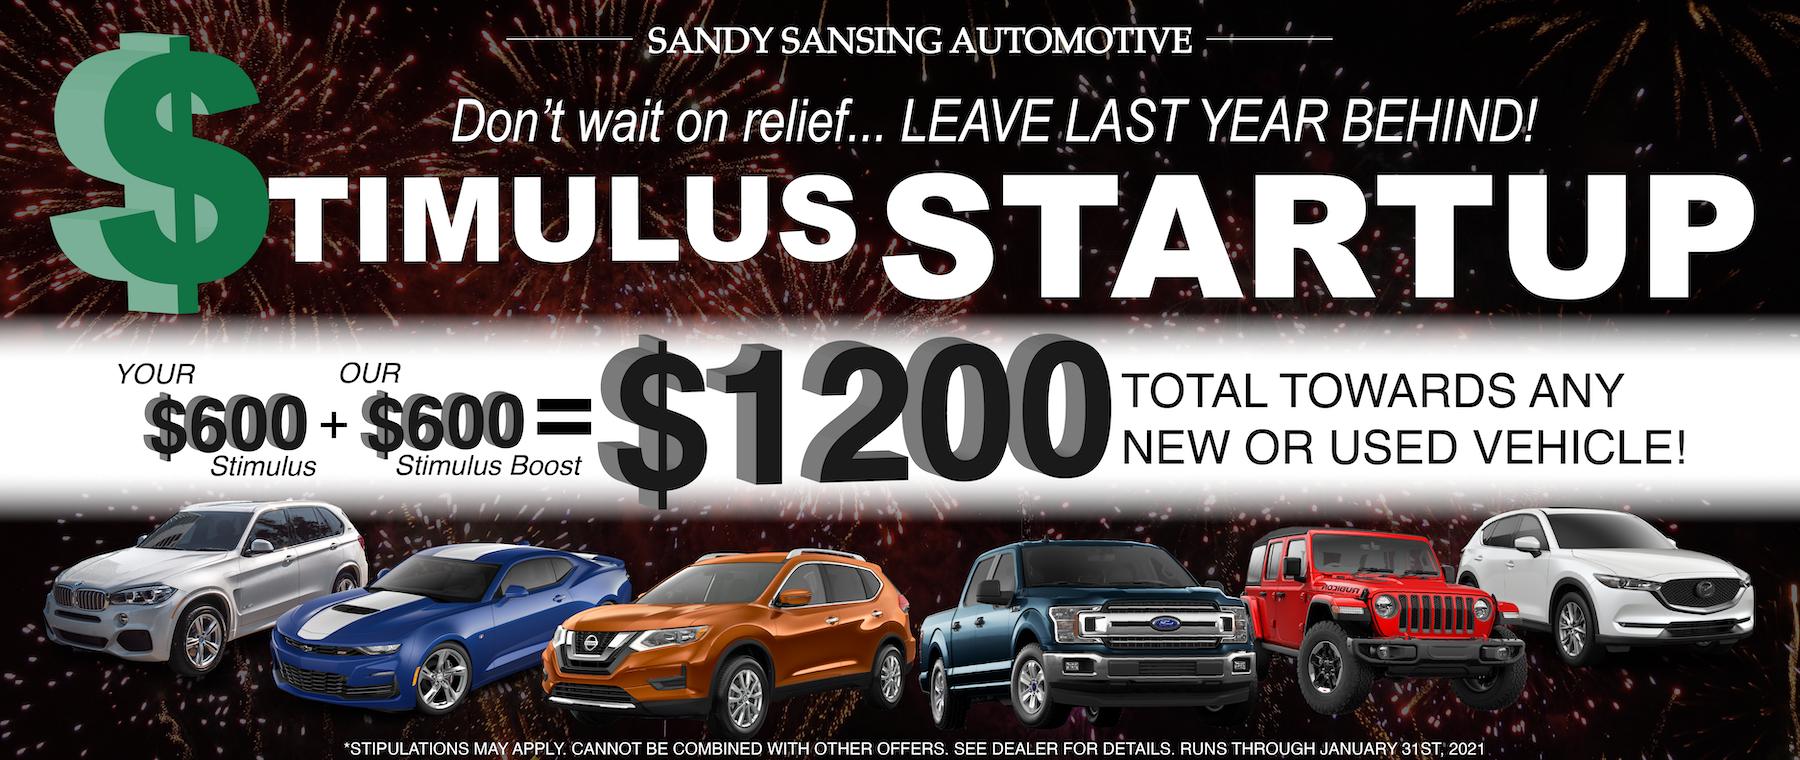 Stimulus Boost multiple vehicles